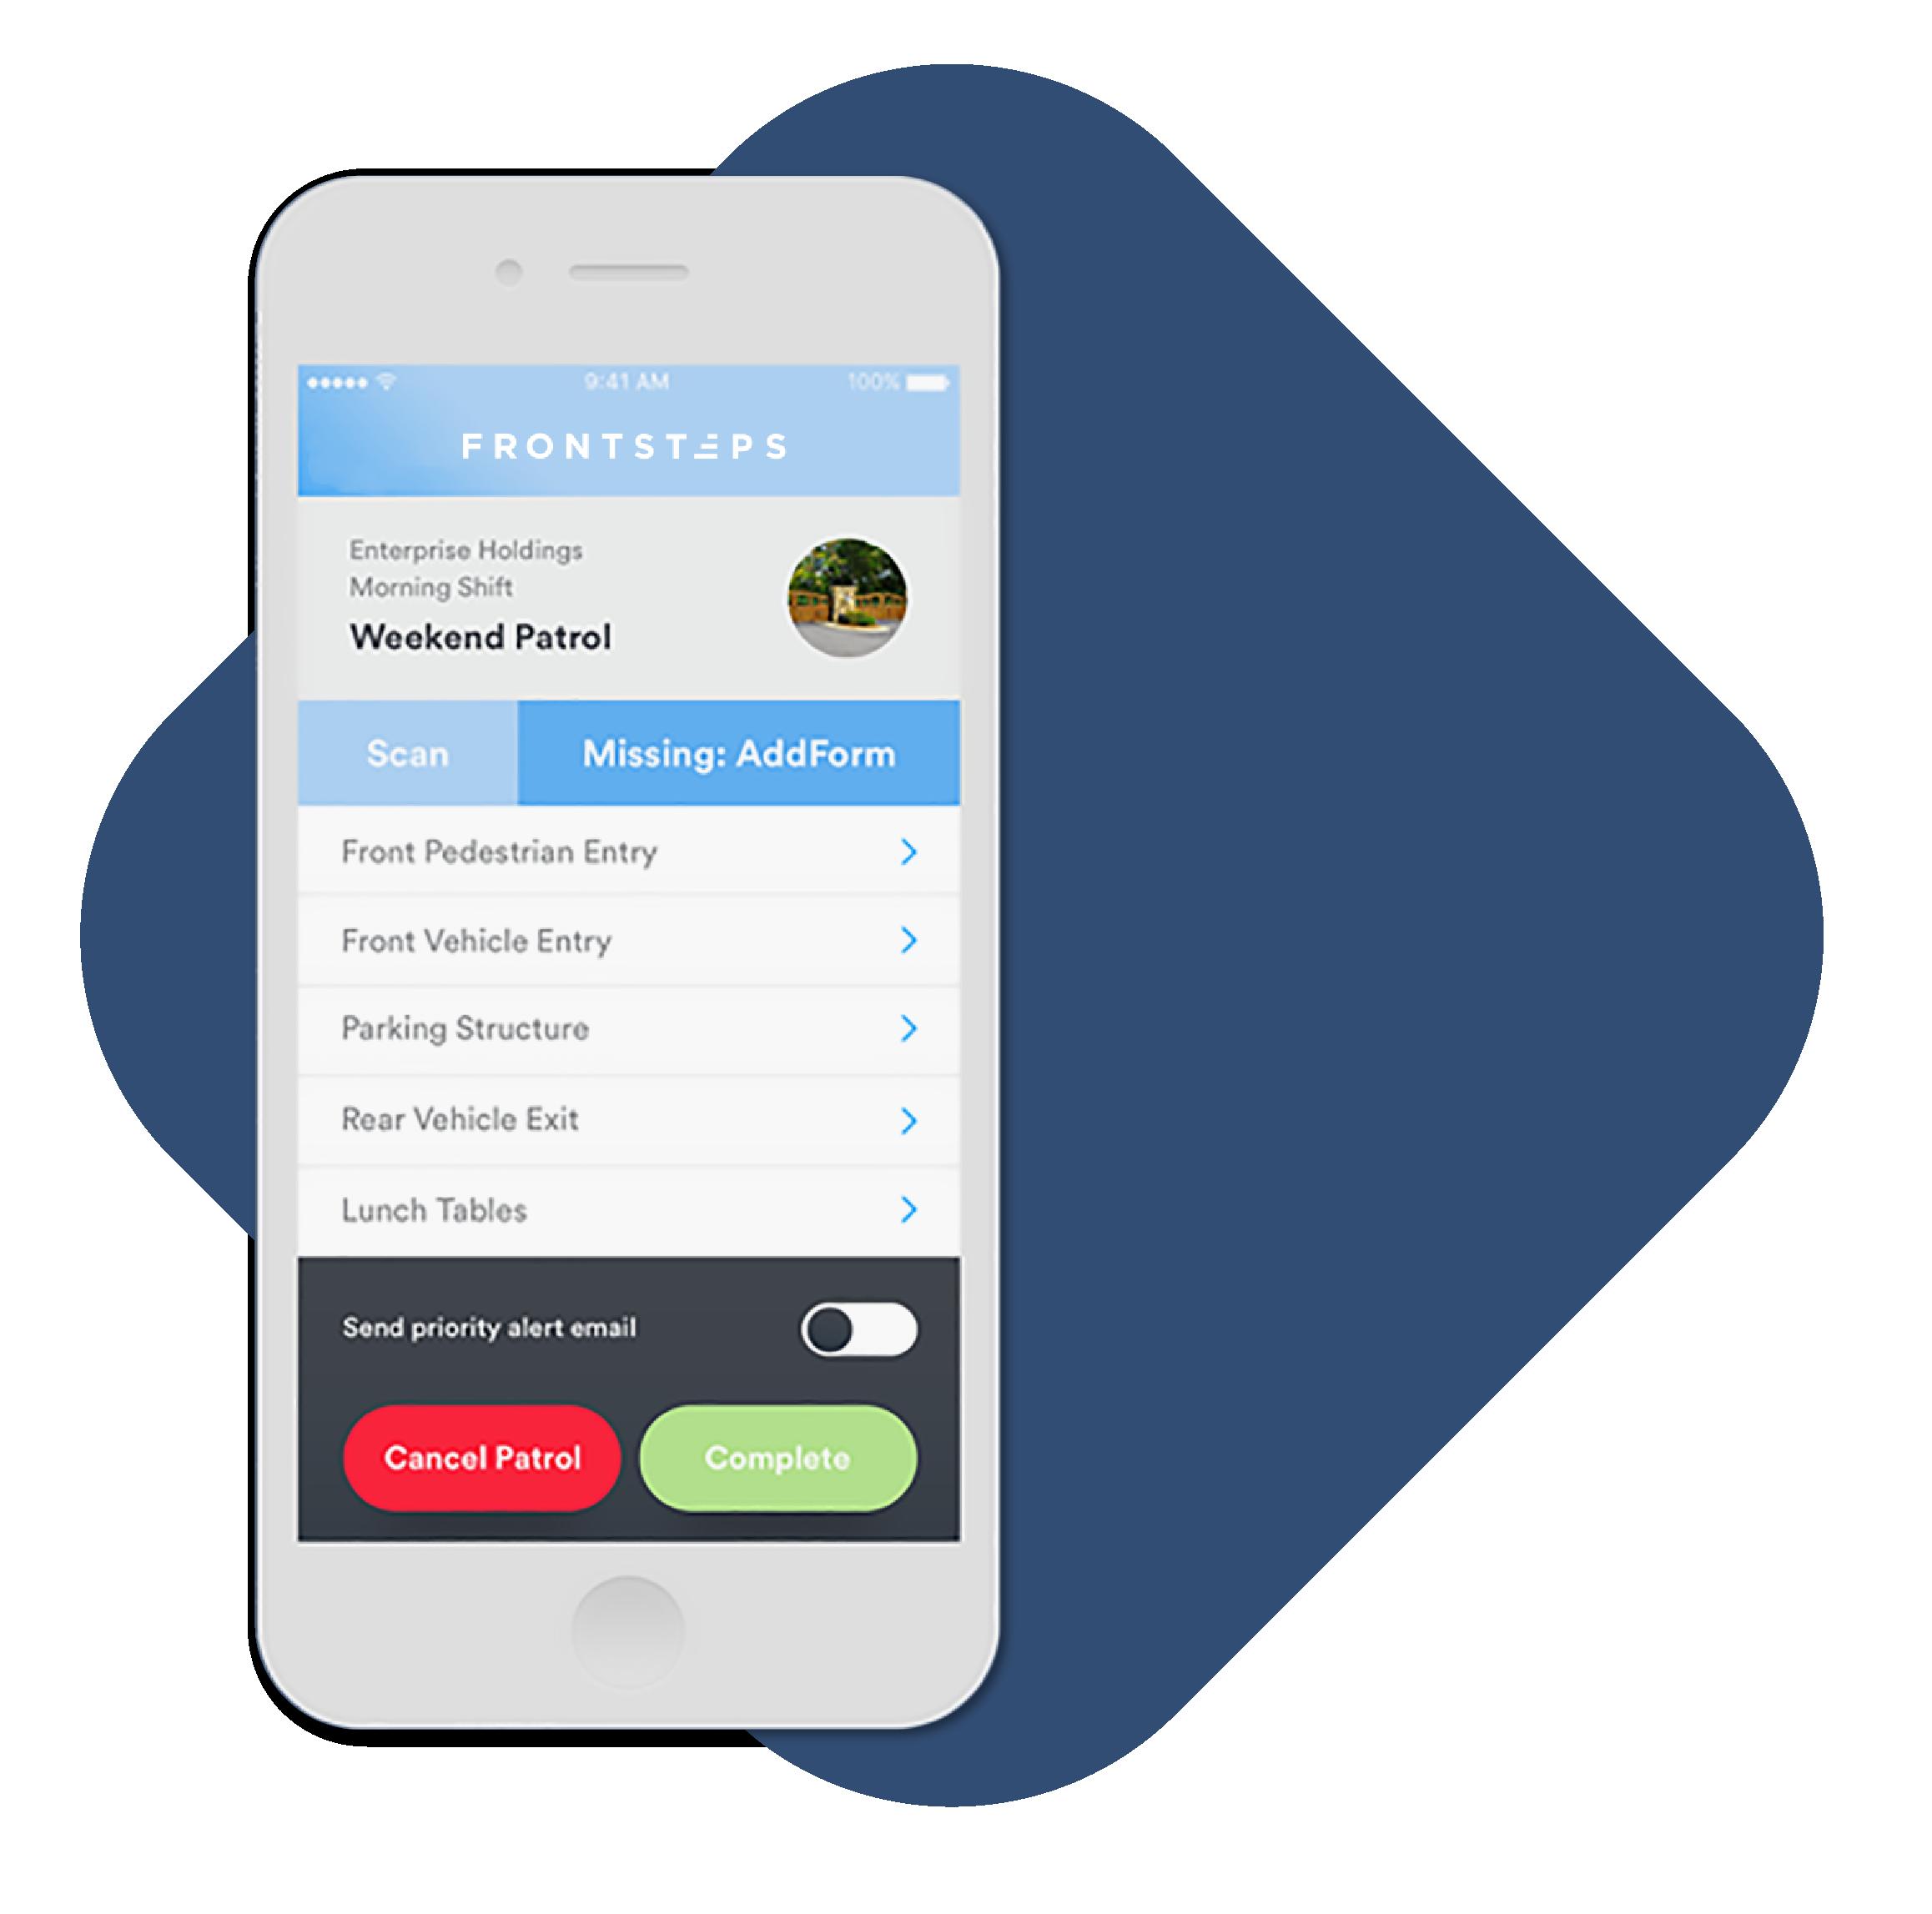 Cellphone Interface - Patrol App Interface